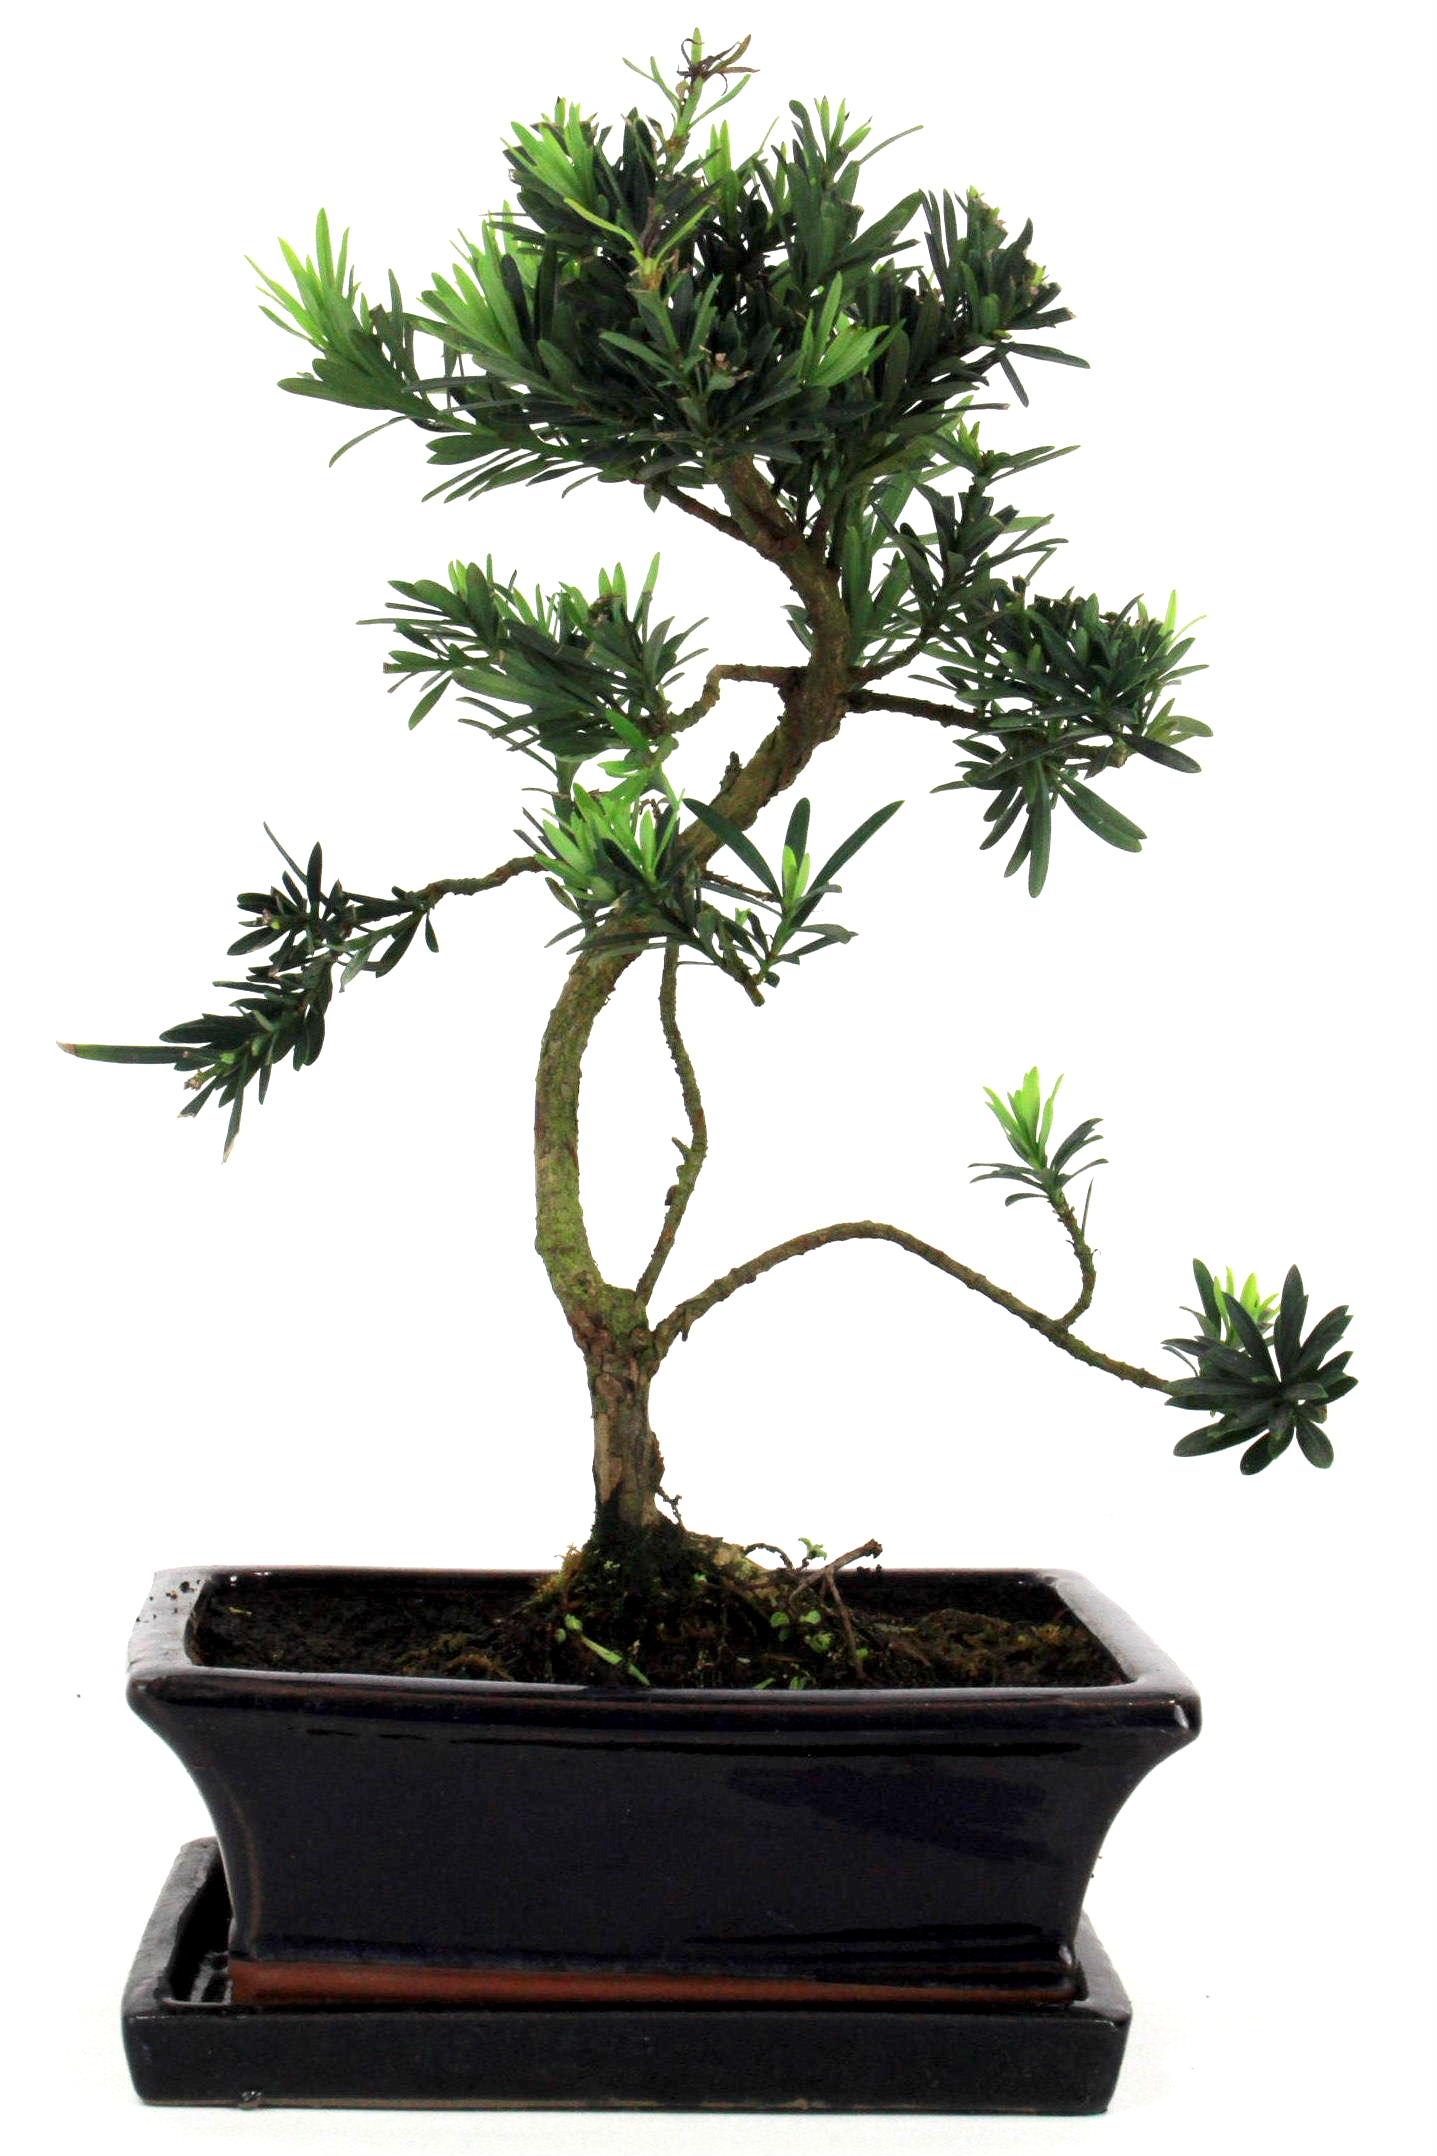 steineibe bonsai 35 40 cm 192 bei oyaki bonsai kaufen. Black Bedroom Furniture Sets. Home Design Ideas